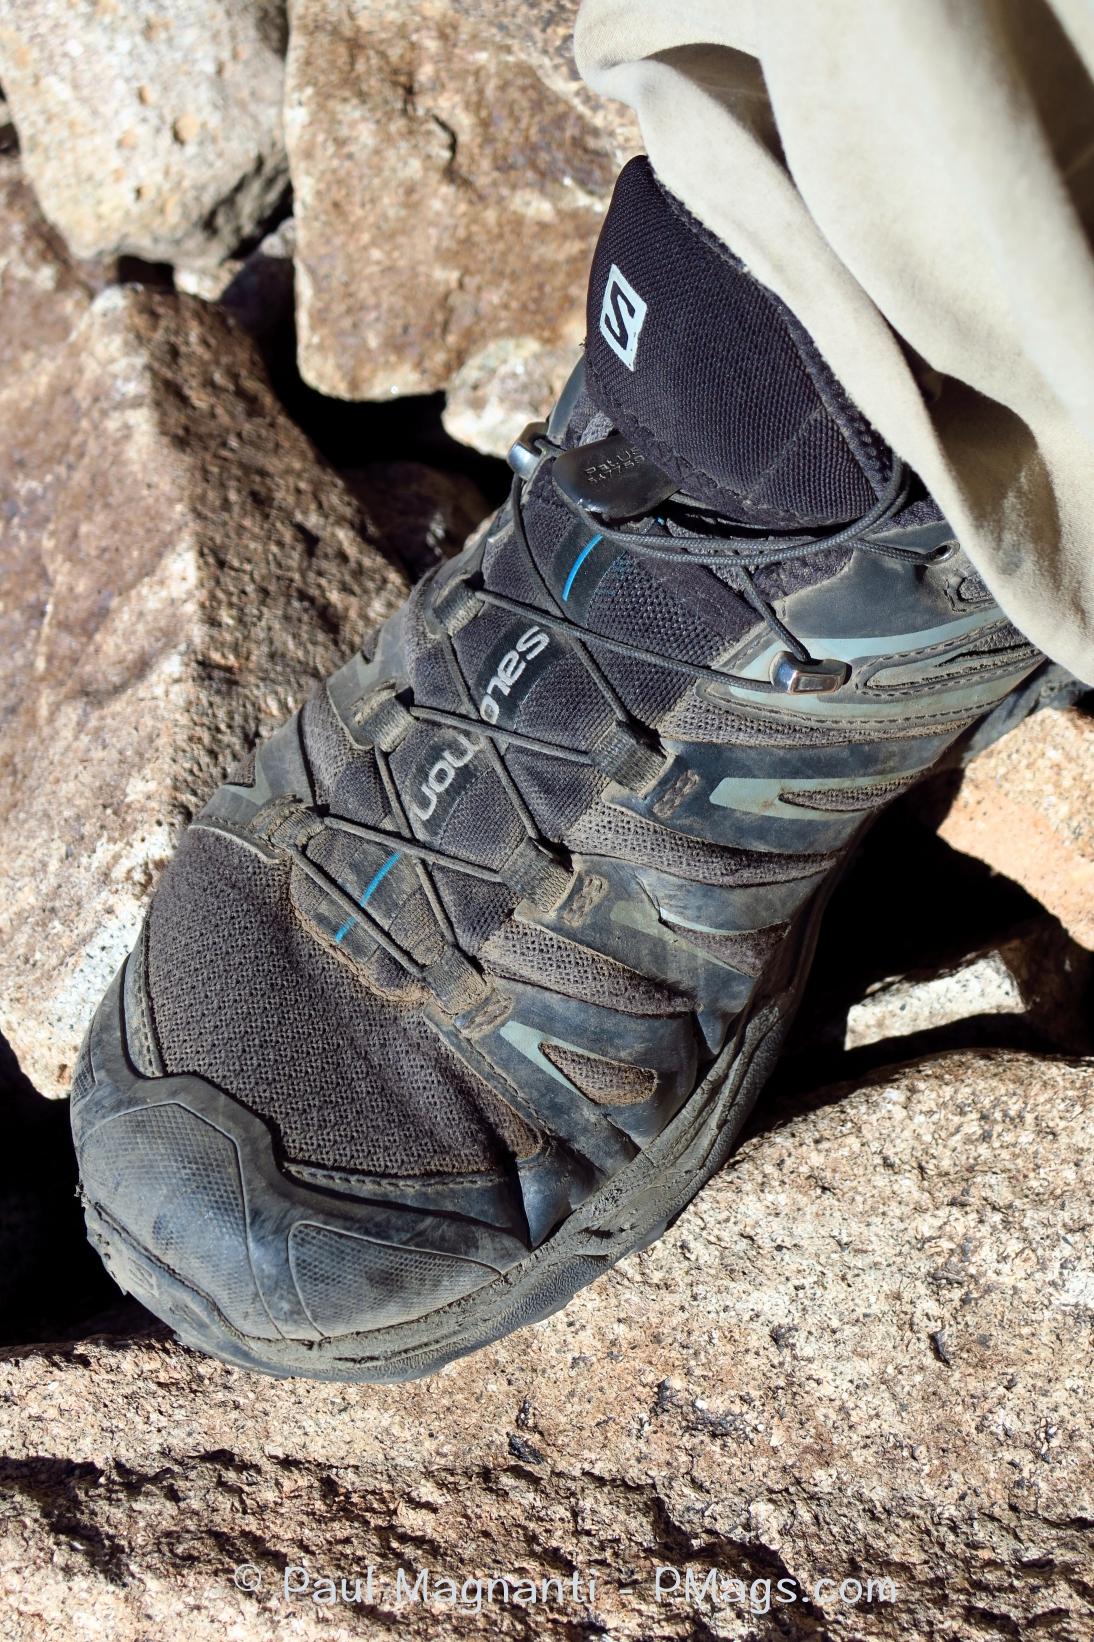 Gear review: Salomon X Ultra 3 Hiking